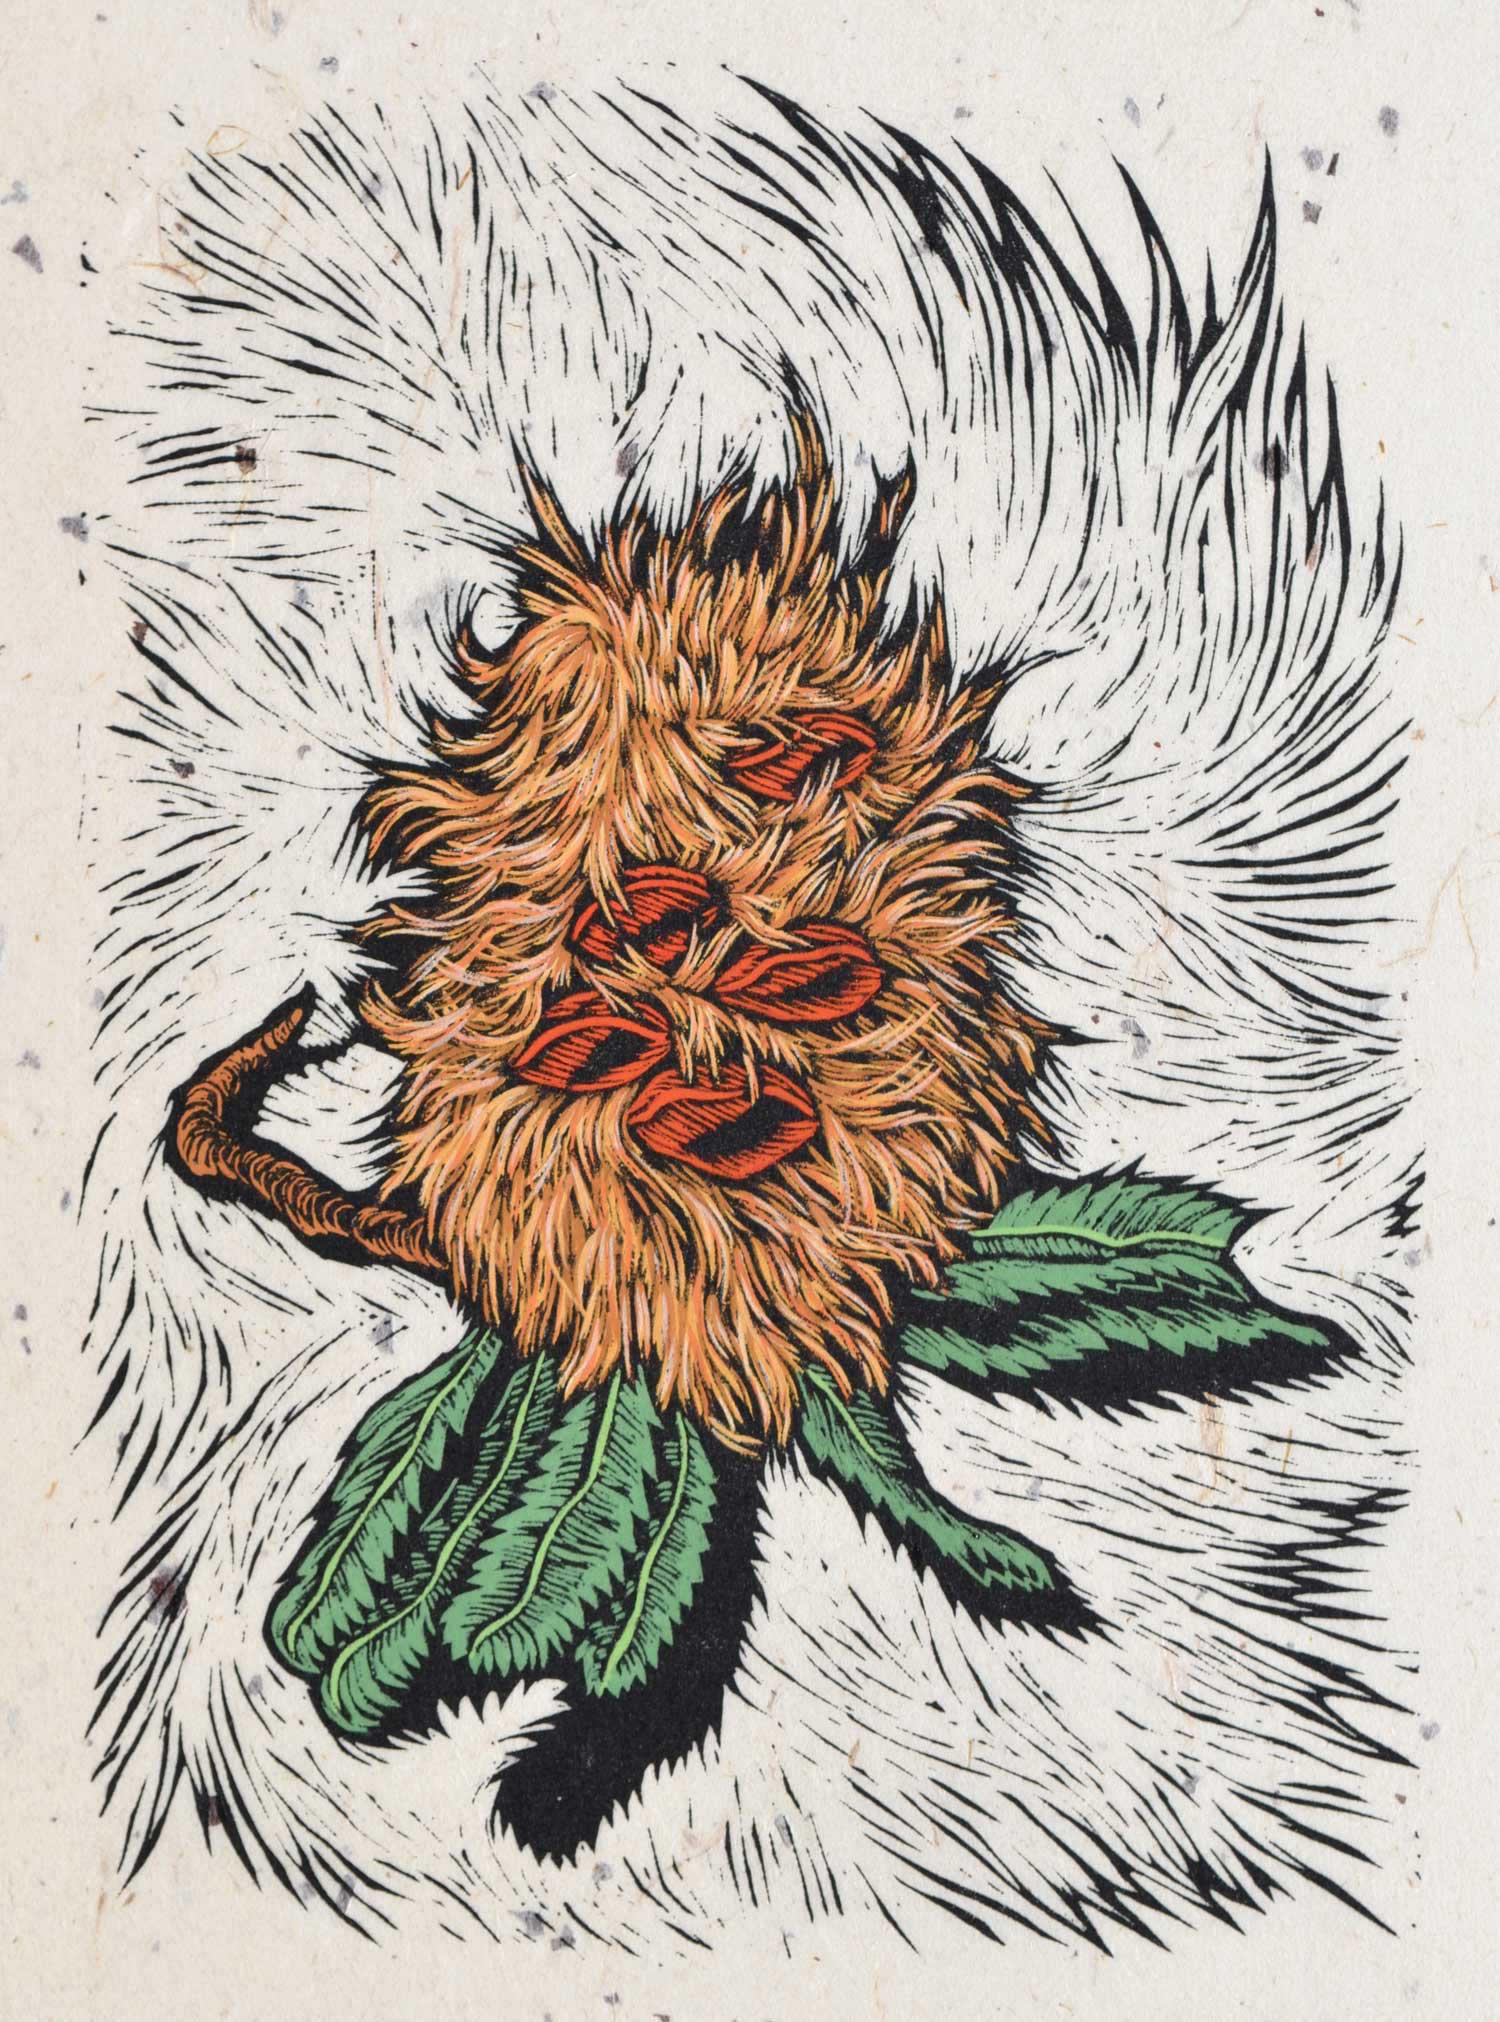 Banksia Man  41 x 29 cm, Edition of 50  Hand-Coloured Linocut on handmade Japanese paper  $850